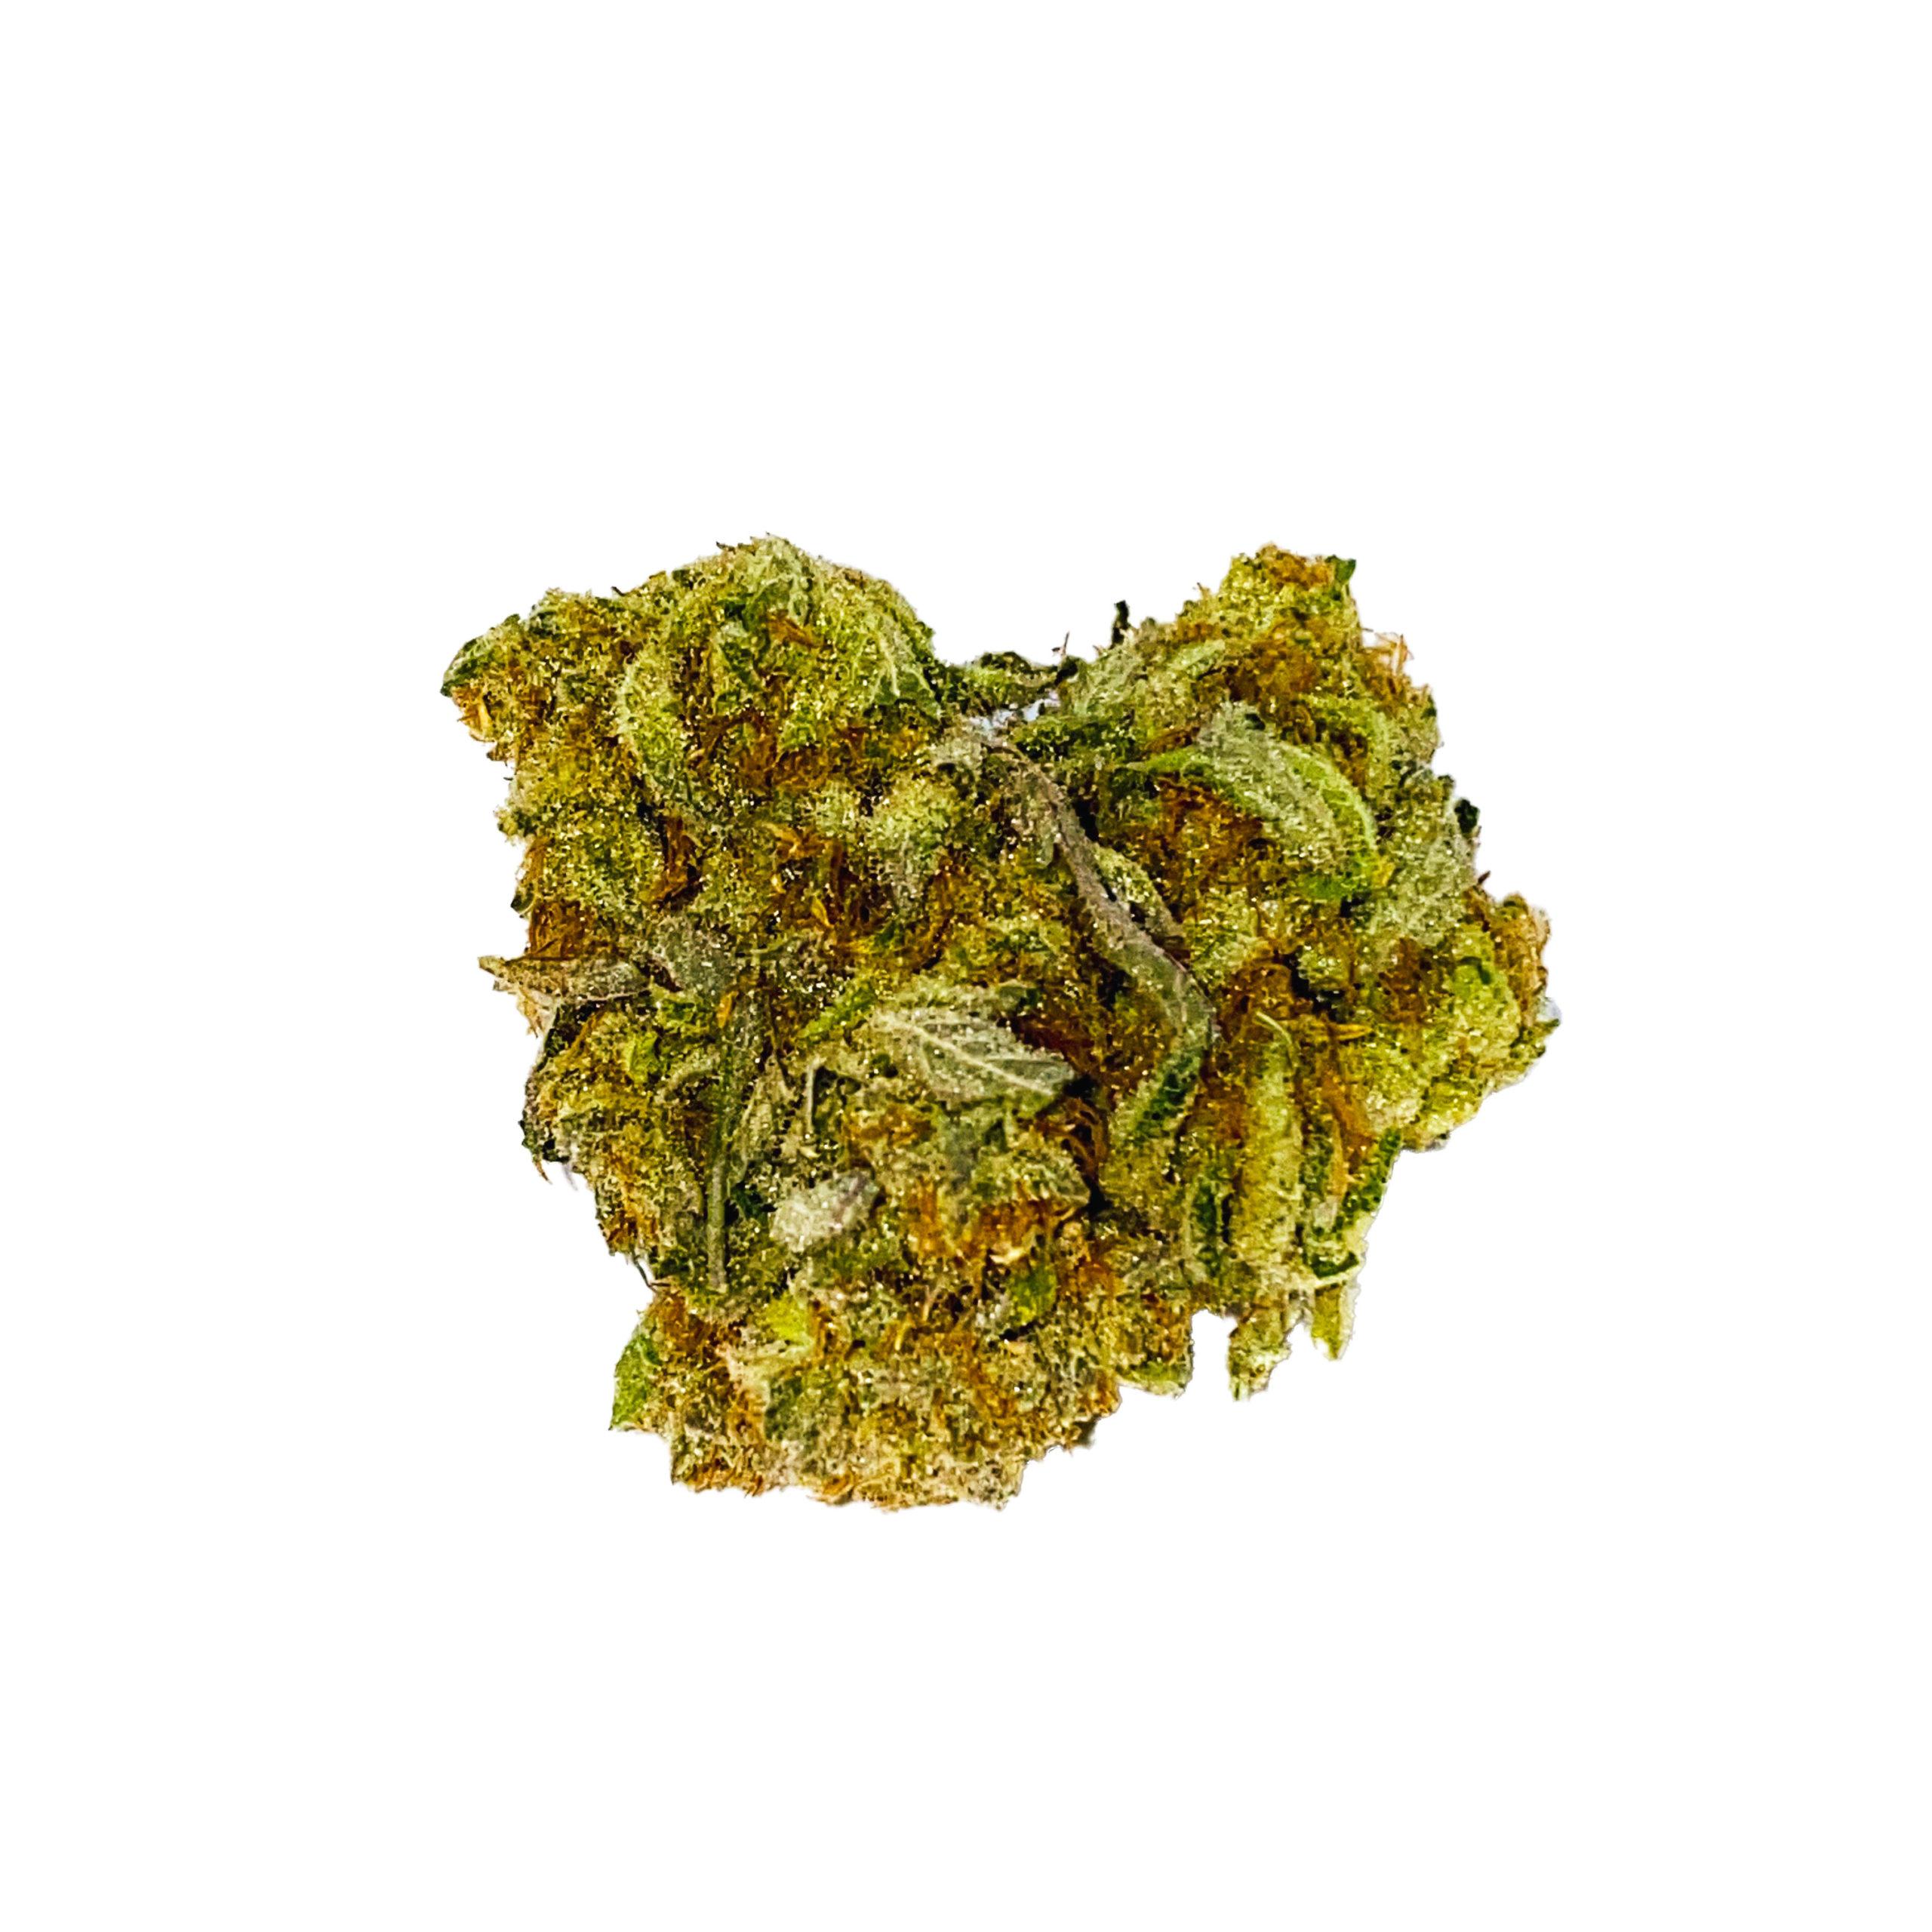 Nupepshrooms,Gelato,Hybrid,Cannabis